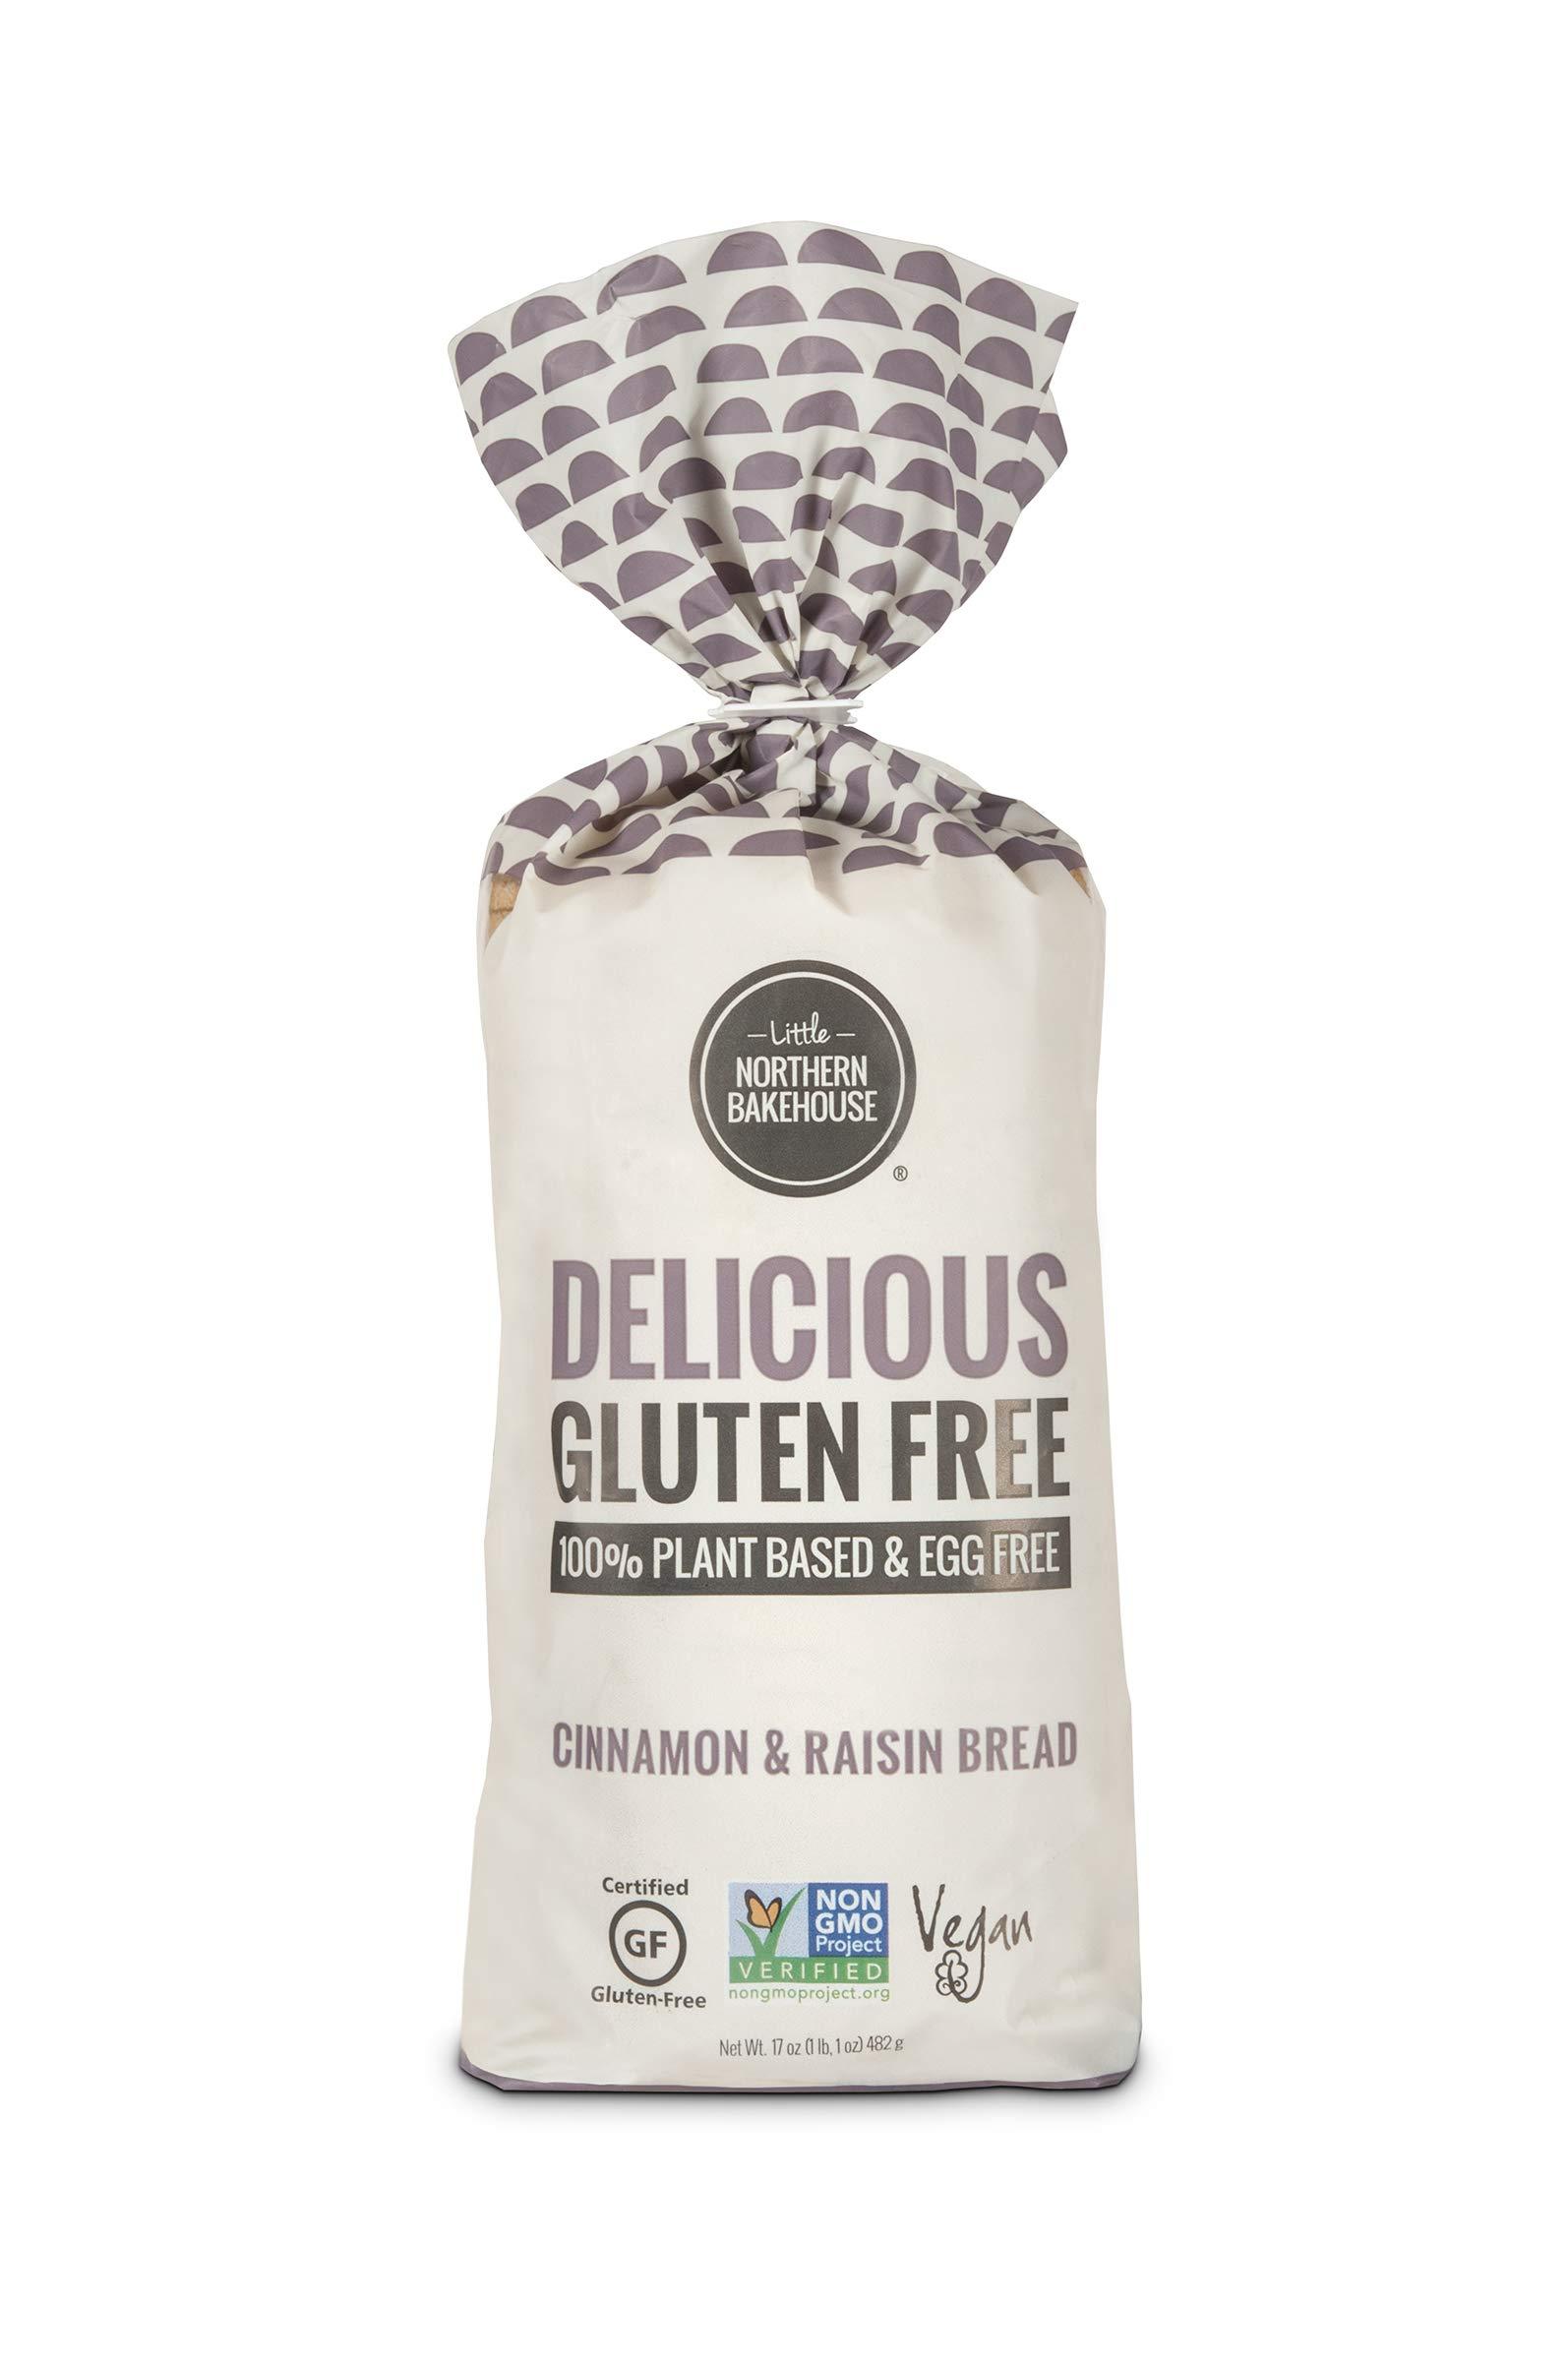 Little Northern Bakehouse Gluten Free Sliced Cinnamon Raisin Bread 17 ounce (Pack of 6)